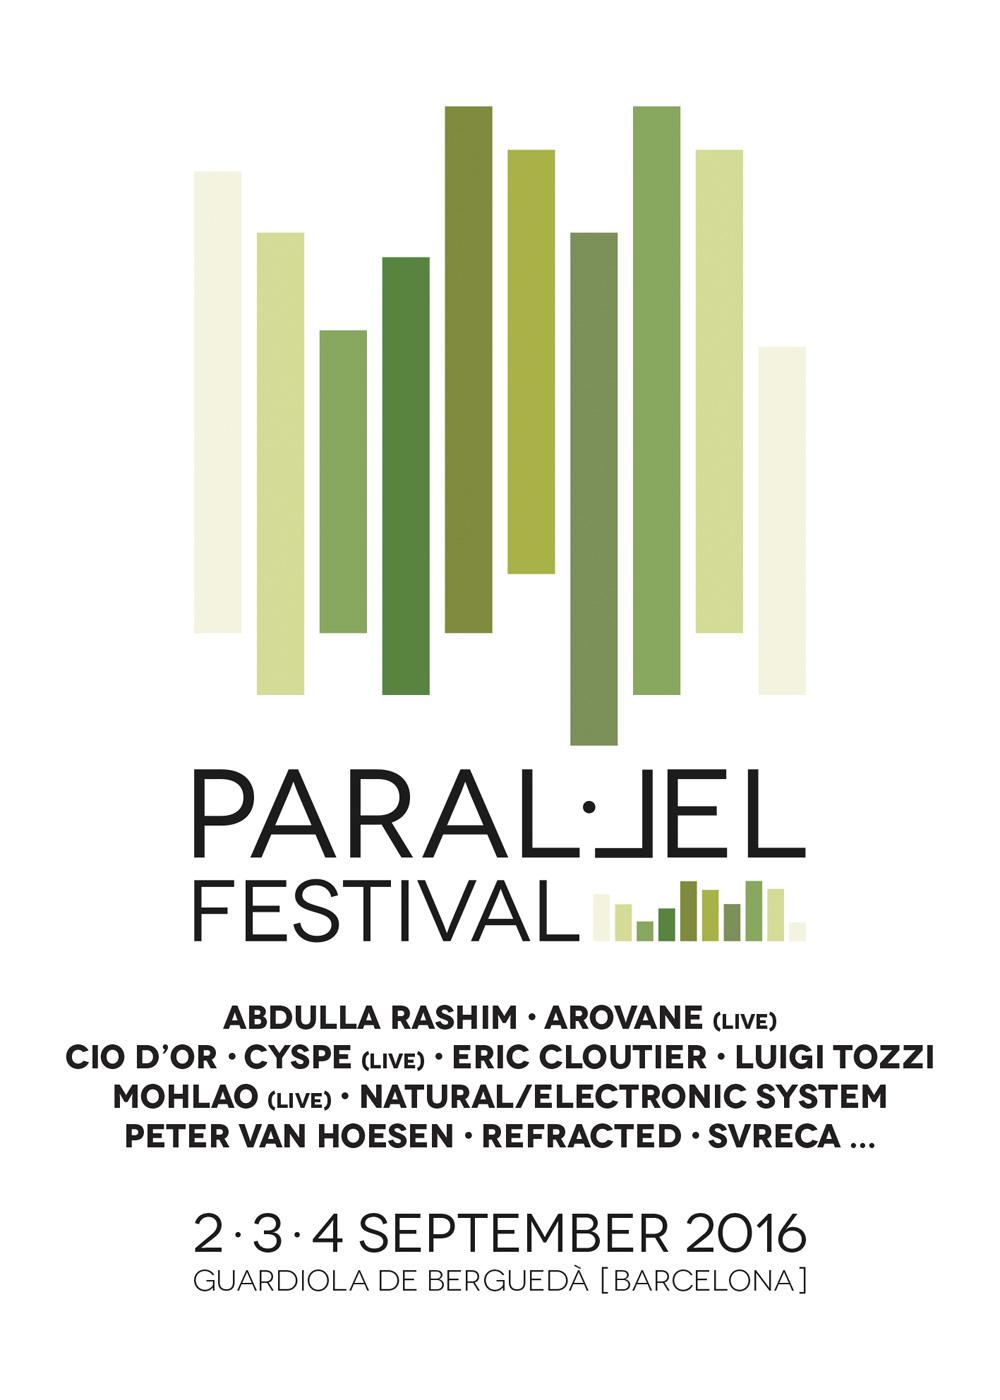 cartel-paral-lel-festival-2016